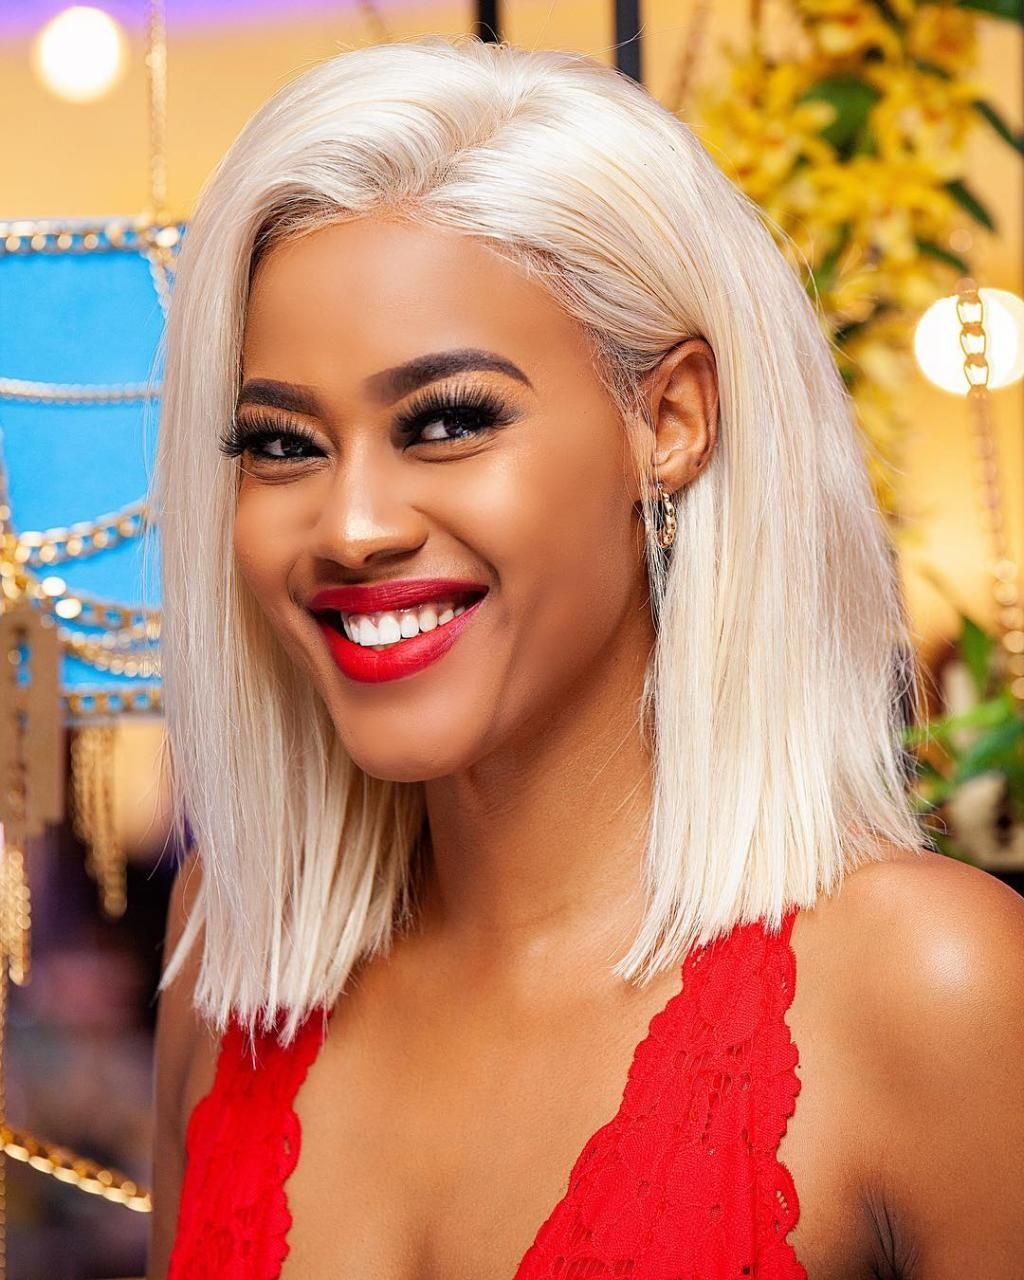 23 Bright Hair Colors For Dark Skin in 2020 Dark blonde